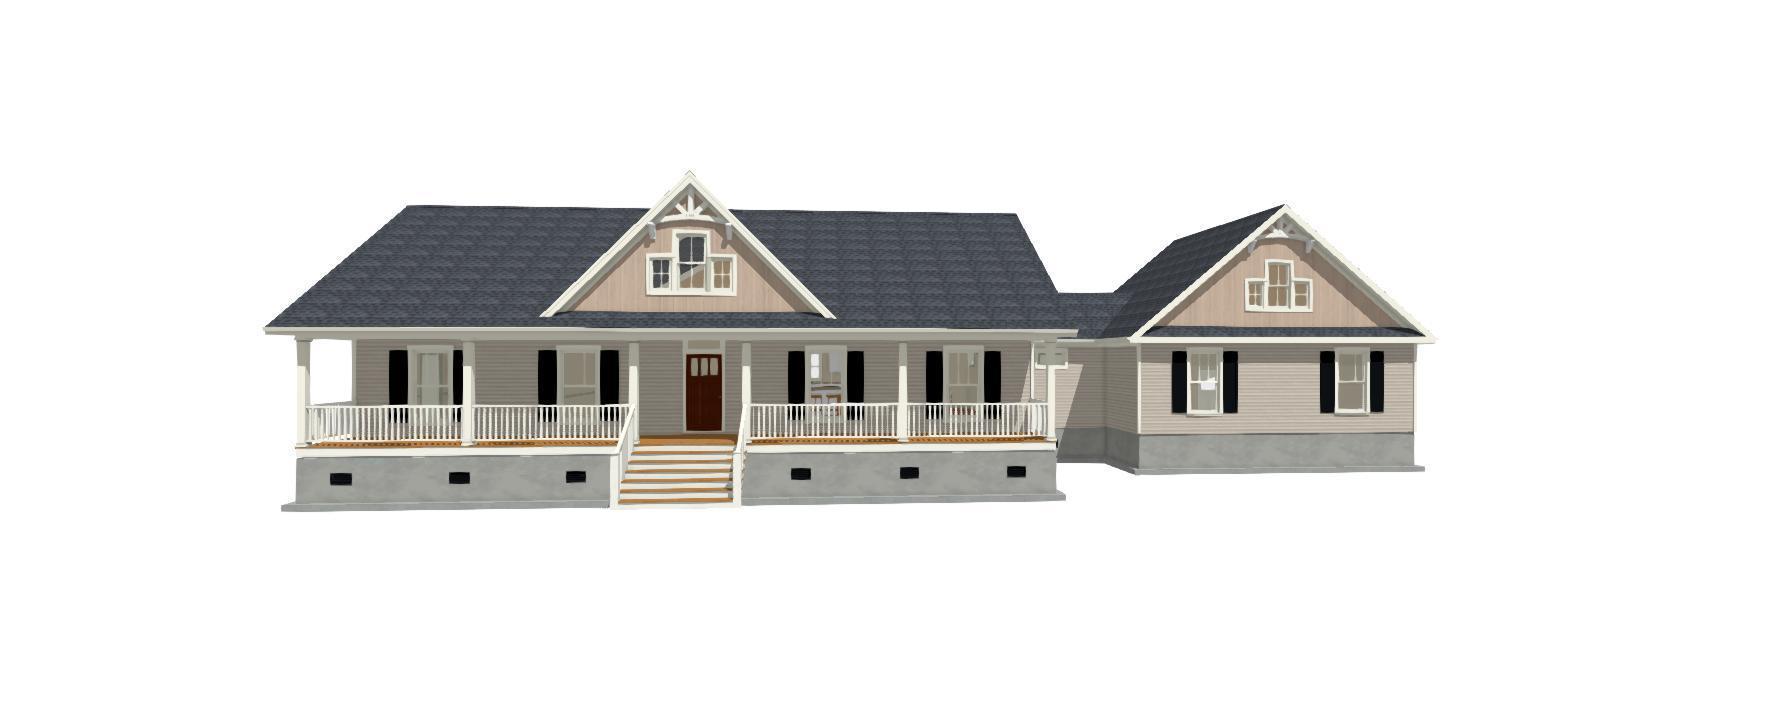 6337 Farm House Road Ravenel, SC 29470